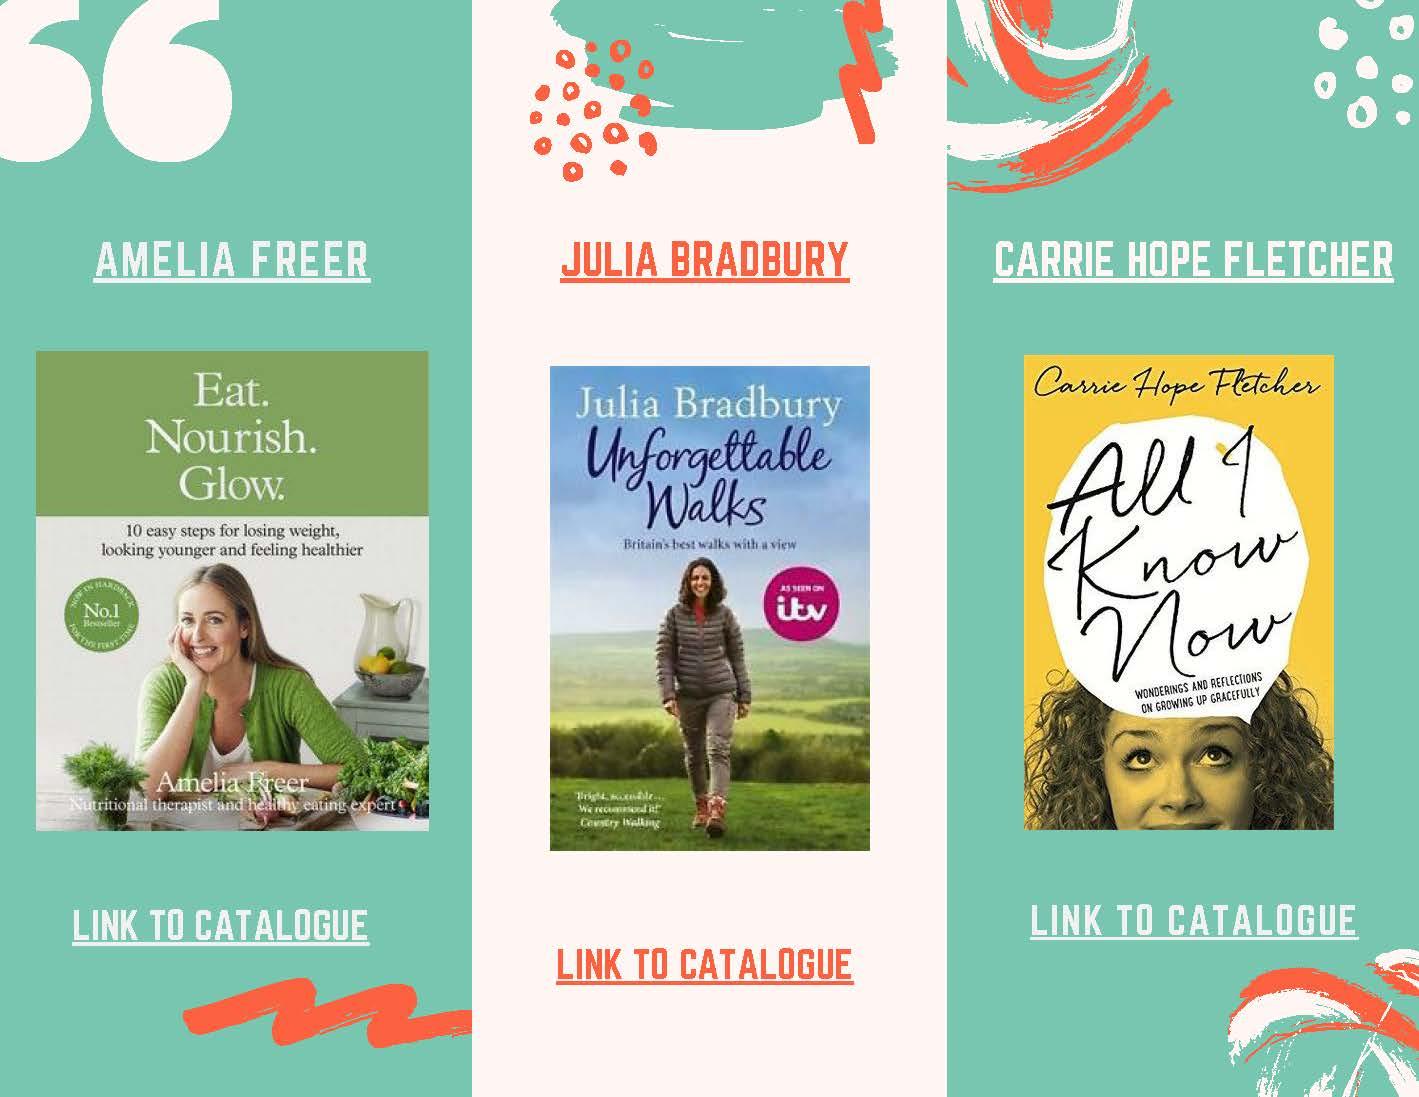 Amelia freer,Julia Bradbury and Carrie Hope Fletcher book covers